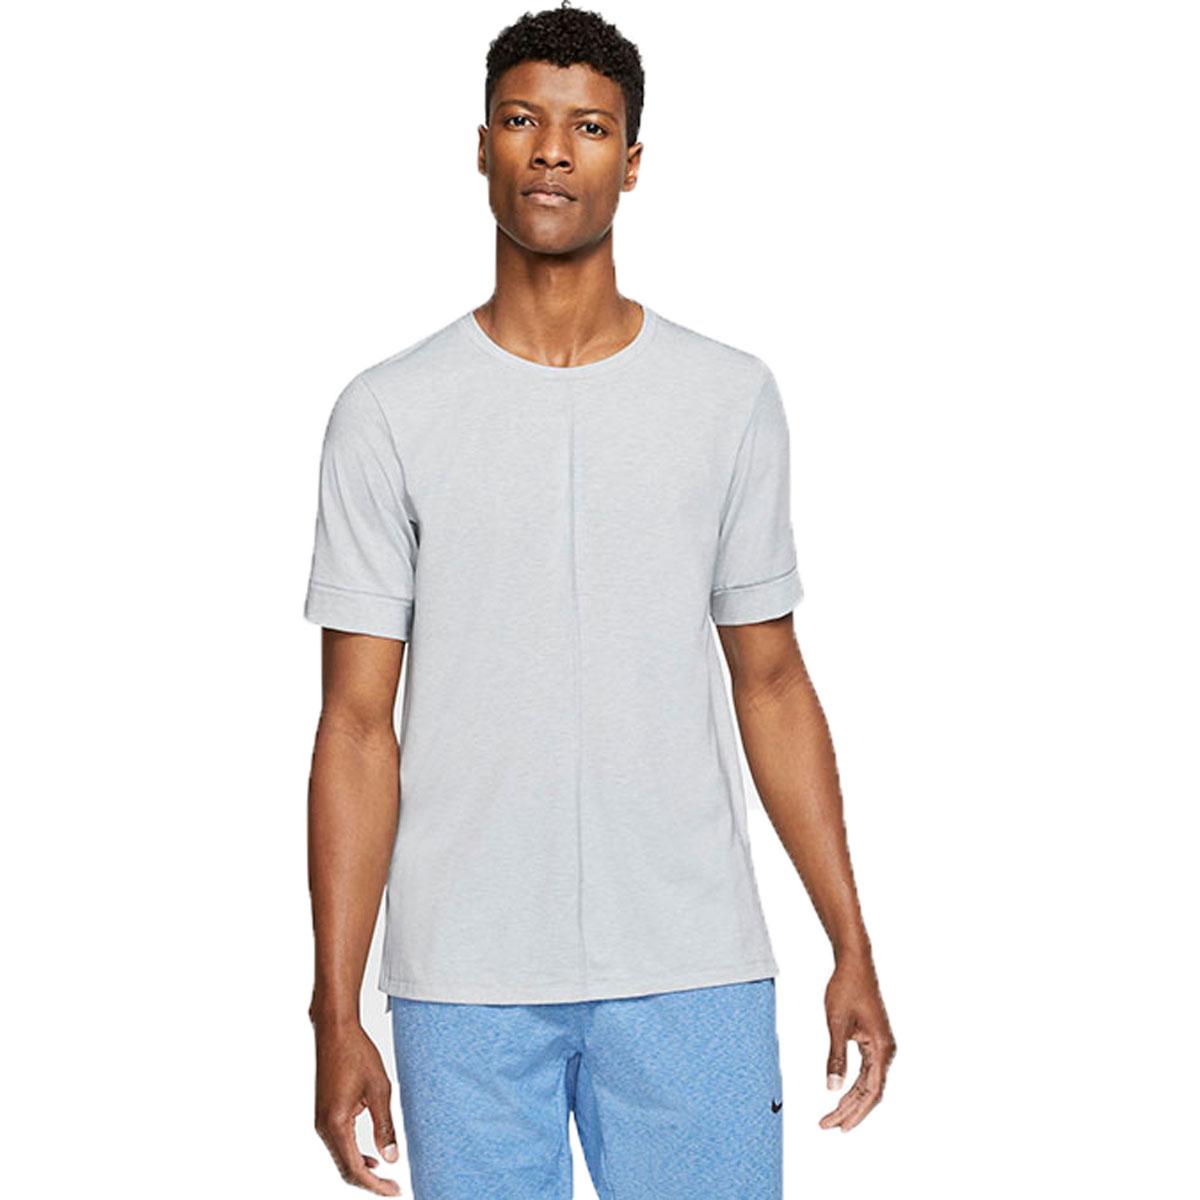 Men's Nike Dri-FIT Yoga Short Sleeve Top, , large, image 1